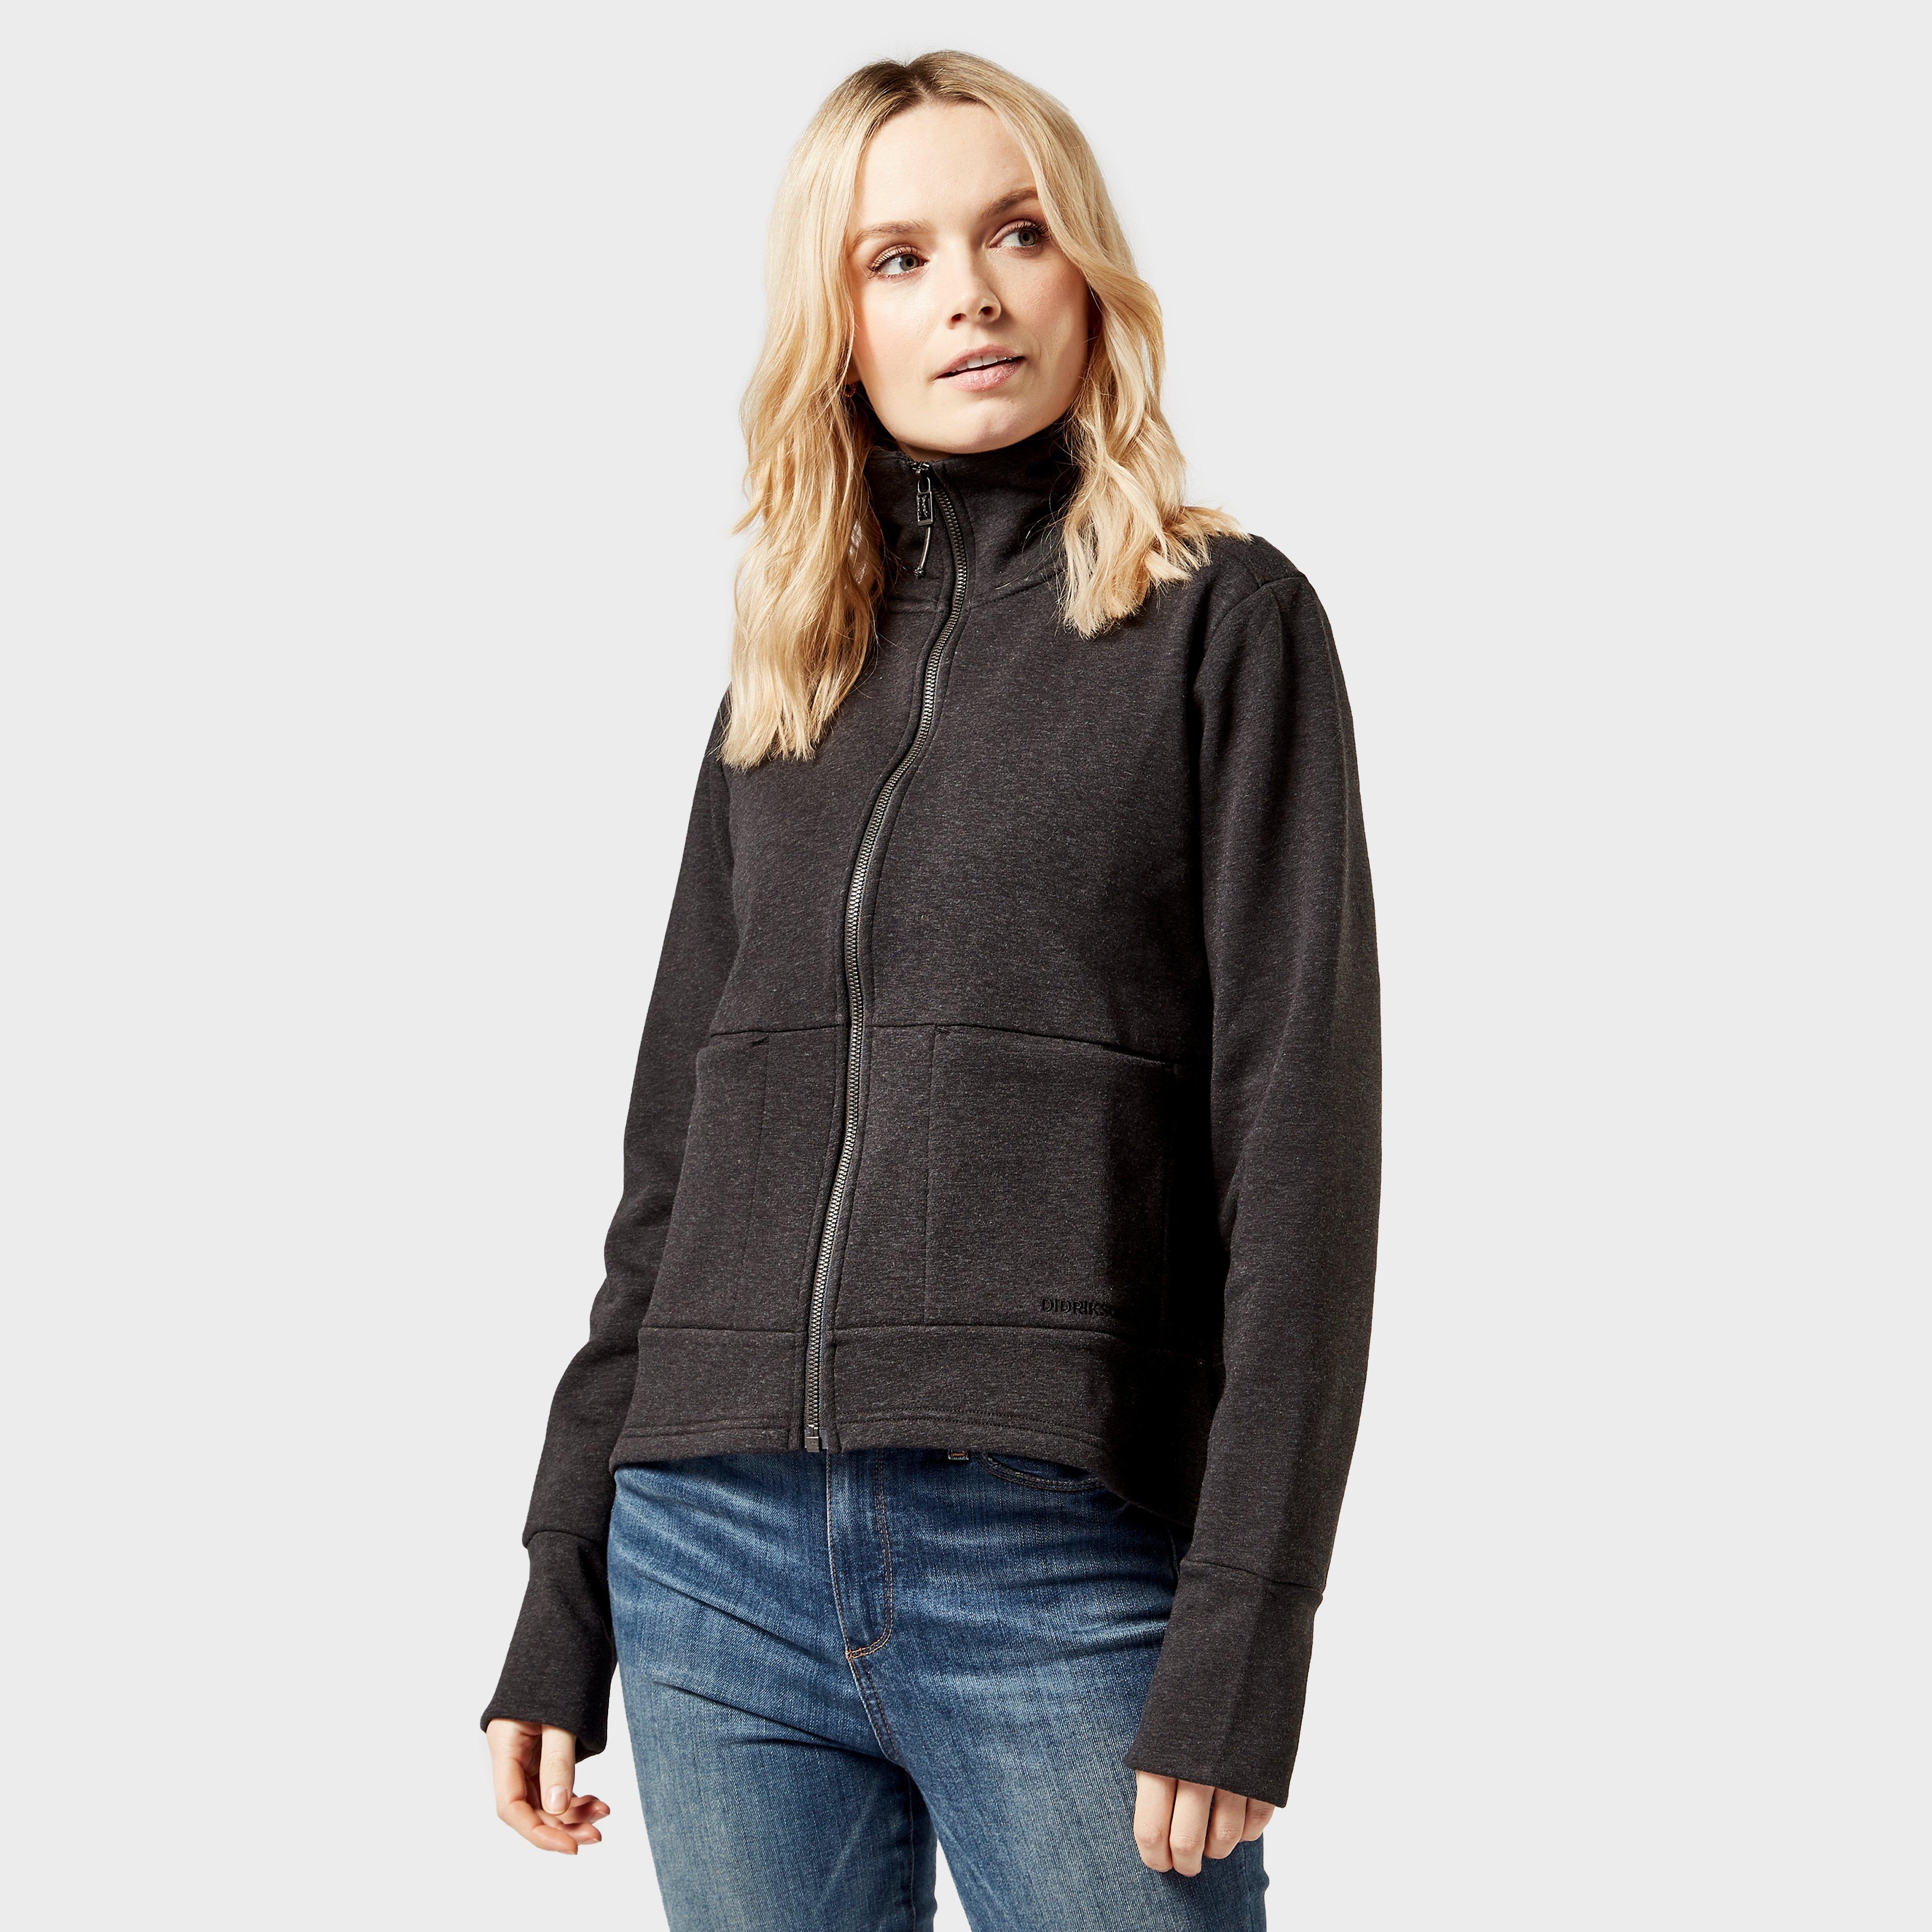 Didriksons Women's Mikaela Full-Zip Fleece, Black